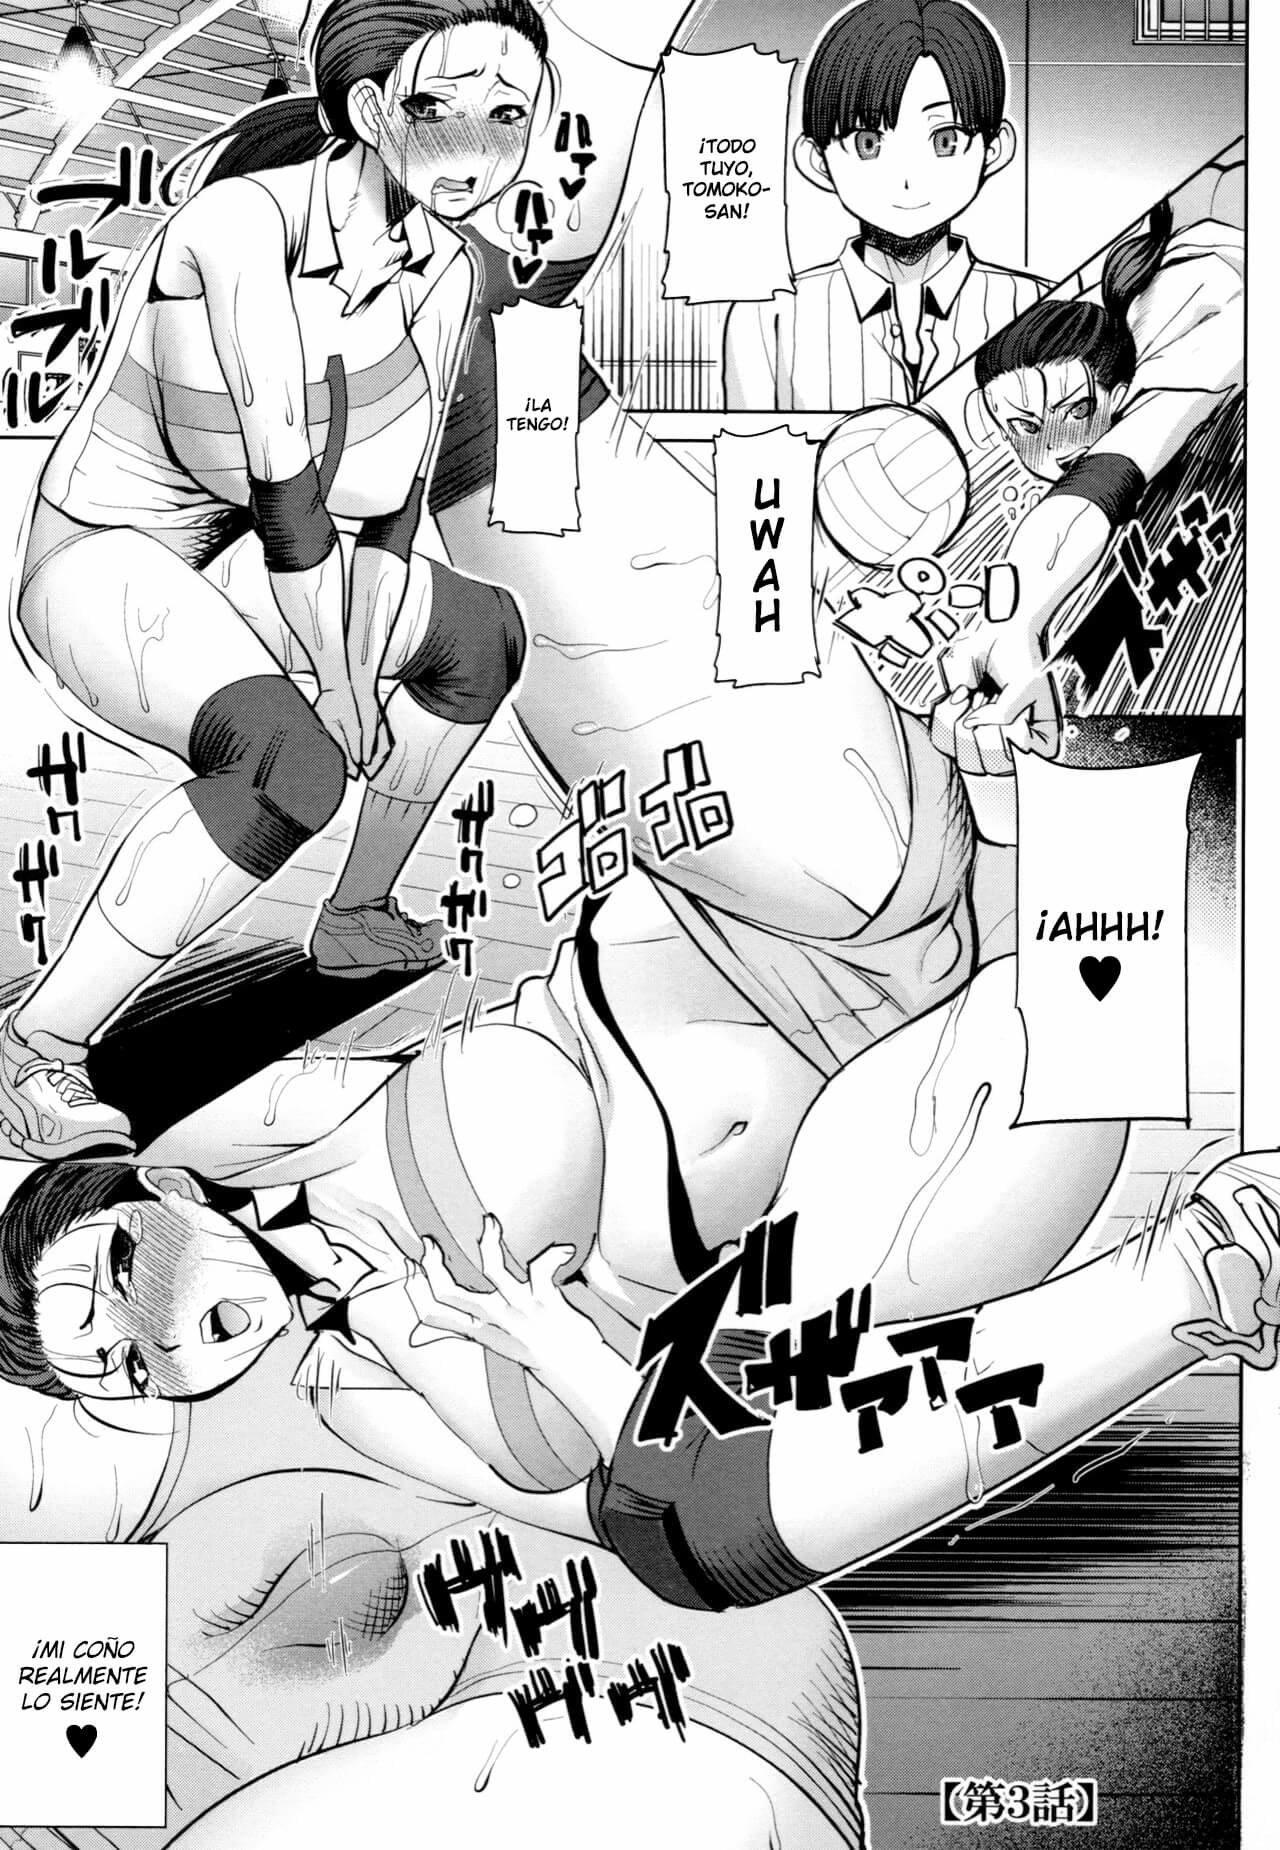 Asahina Ikka Netorareta Haha Tomoko Cap 1-3 - 48